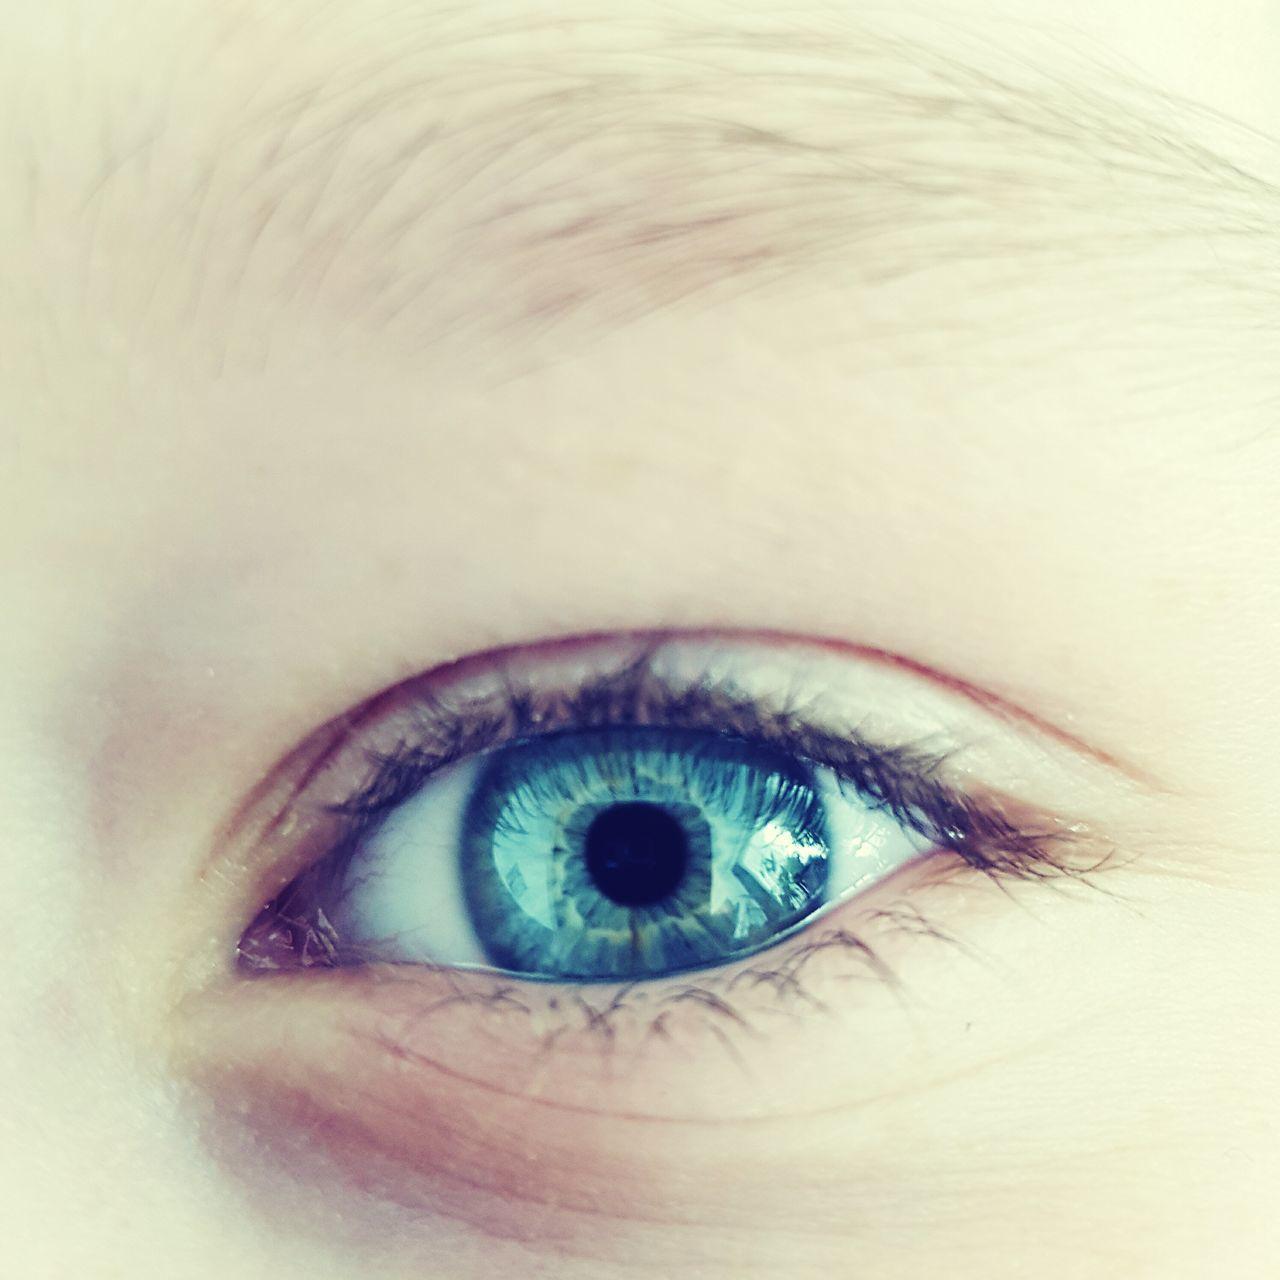 human eye, human body part, eyelash, sensory perception, macro, eyesight, eyeball, iris - eye, one person, close-up, real people, human skin, eyelid, looking at camera, eyebrow, portrait, indoors, day, adult, people